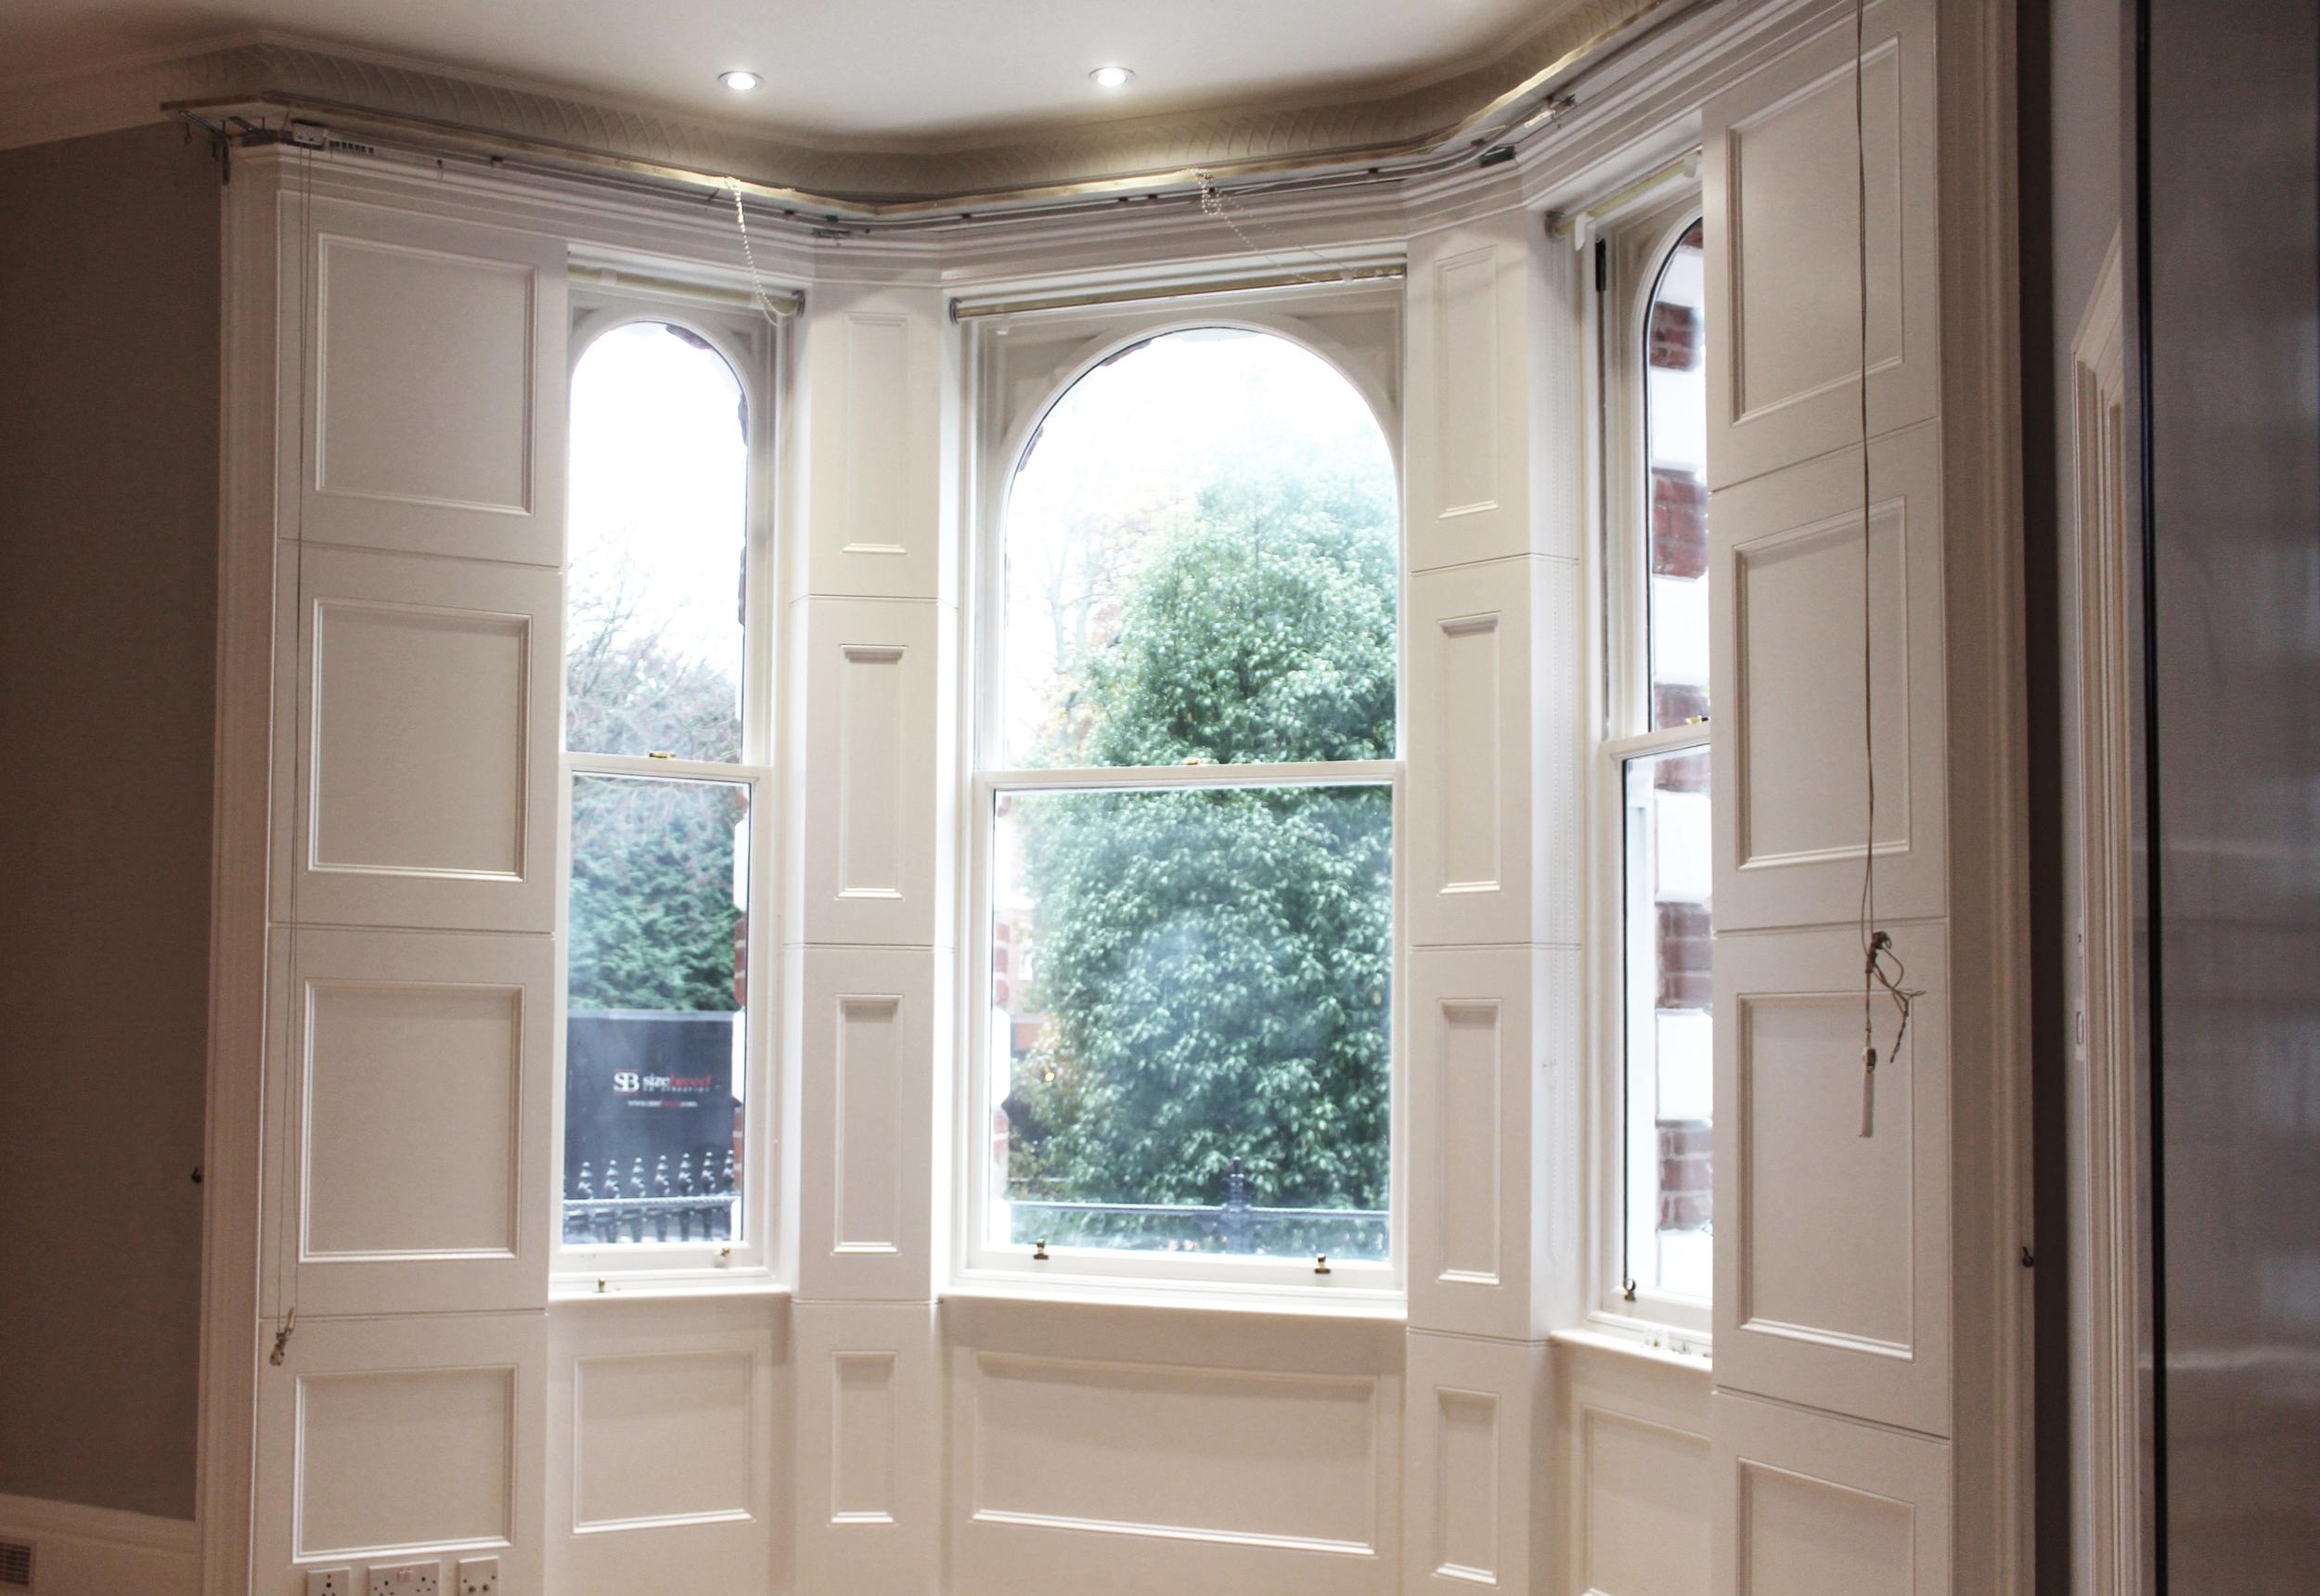 #NHRenovations #Painter #Decorator #London #Kensington #Knightsbridge #Windows #Farrowandball #Farrow #Allwhite #Woodwork #Windows #sashwindow #eggshell